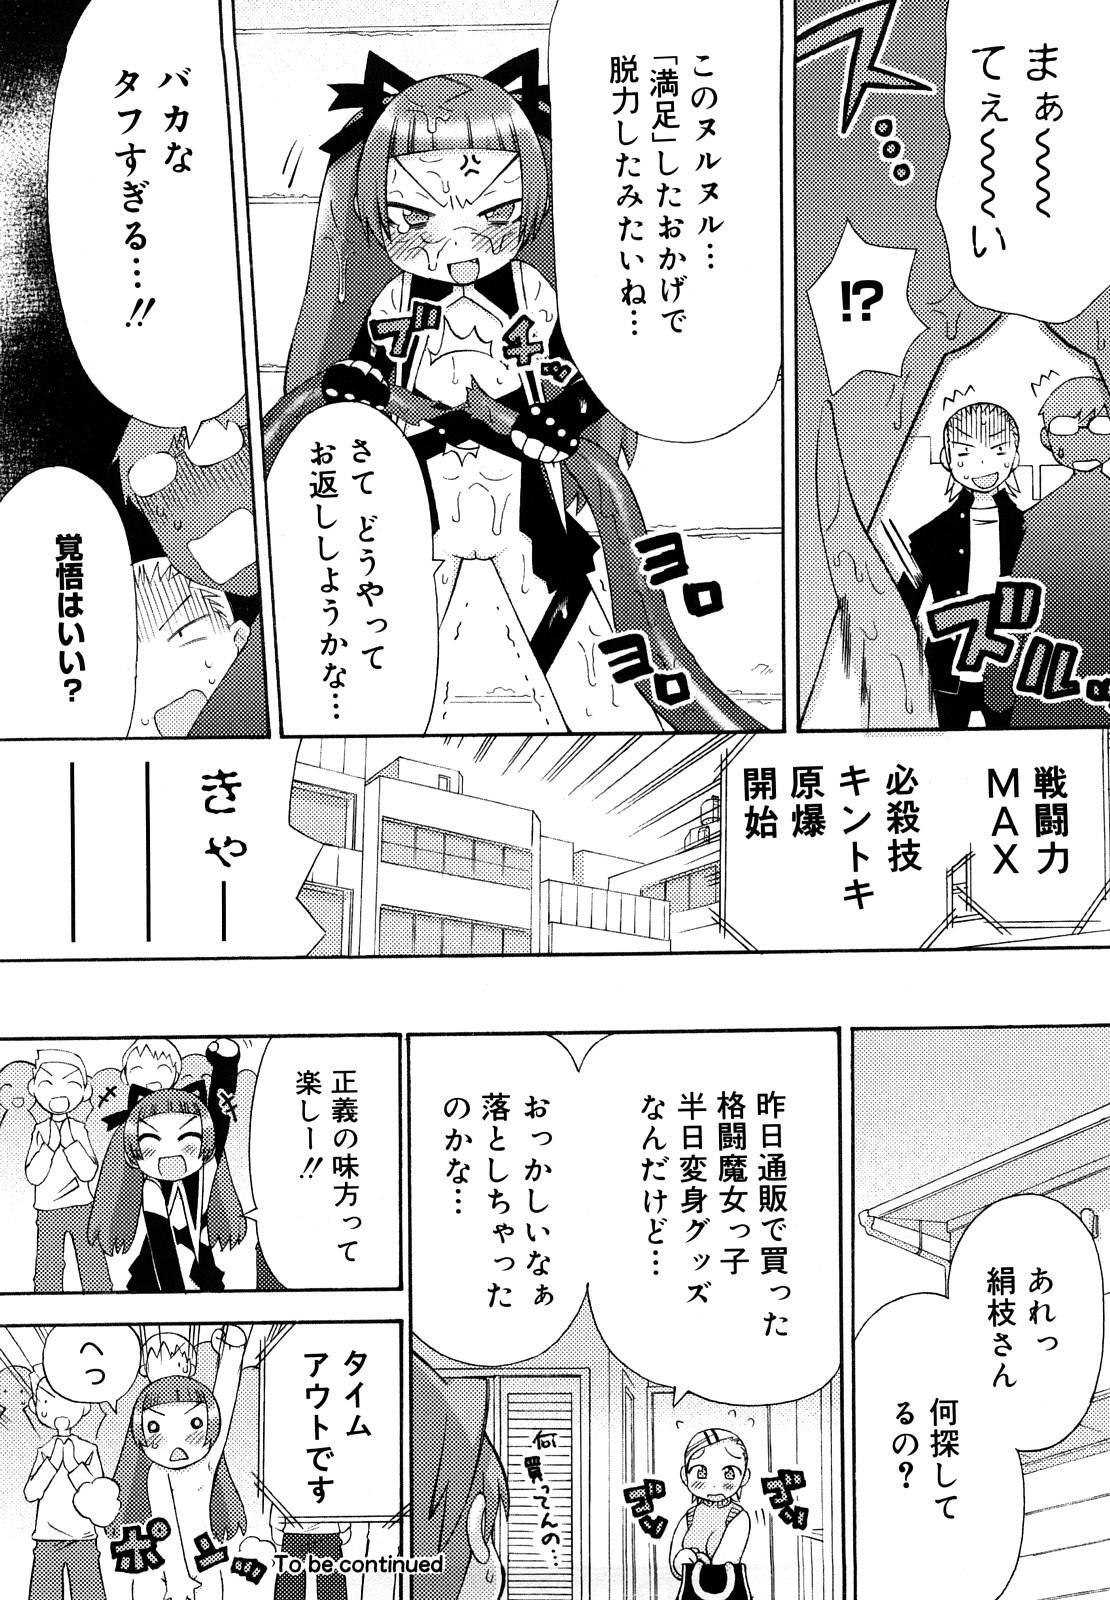 Hatsuden Pandakun! Shinsouban 128